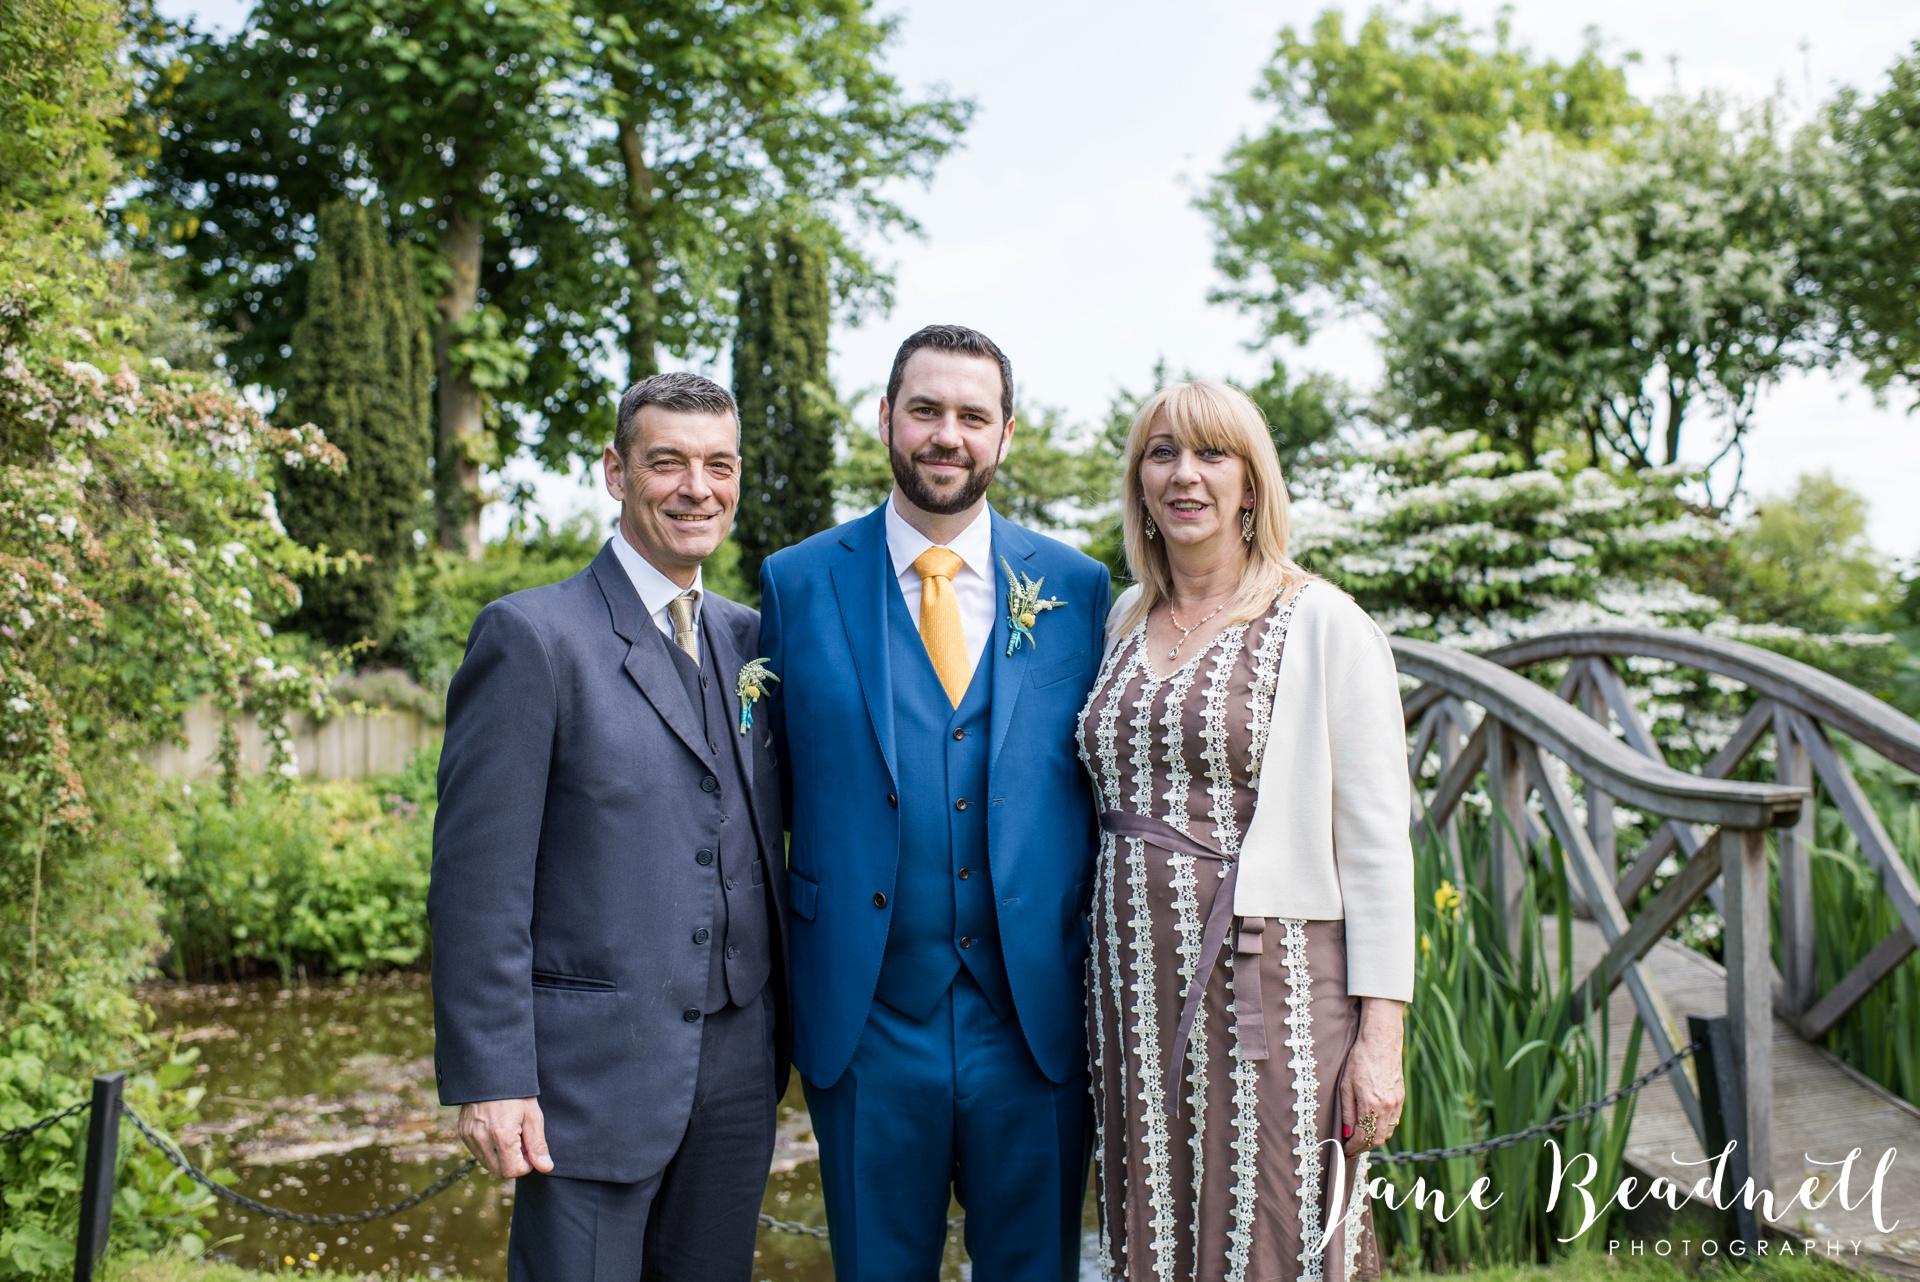 South Farm Wedding photography Hertfordshire by Jane Beadnell Photography fine art wedding photographer_0088